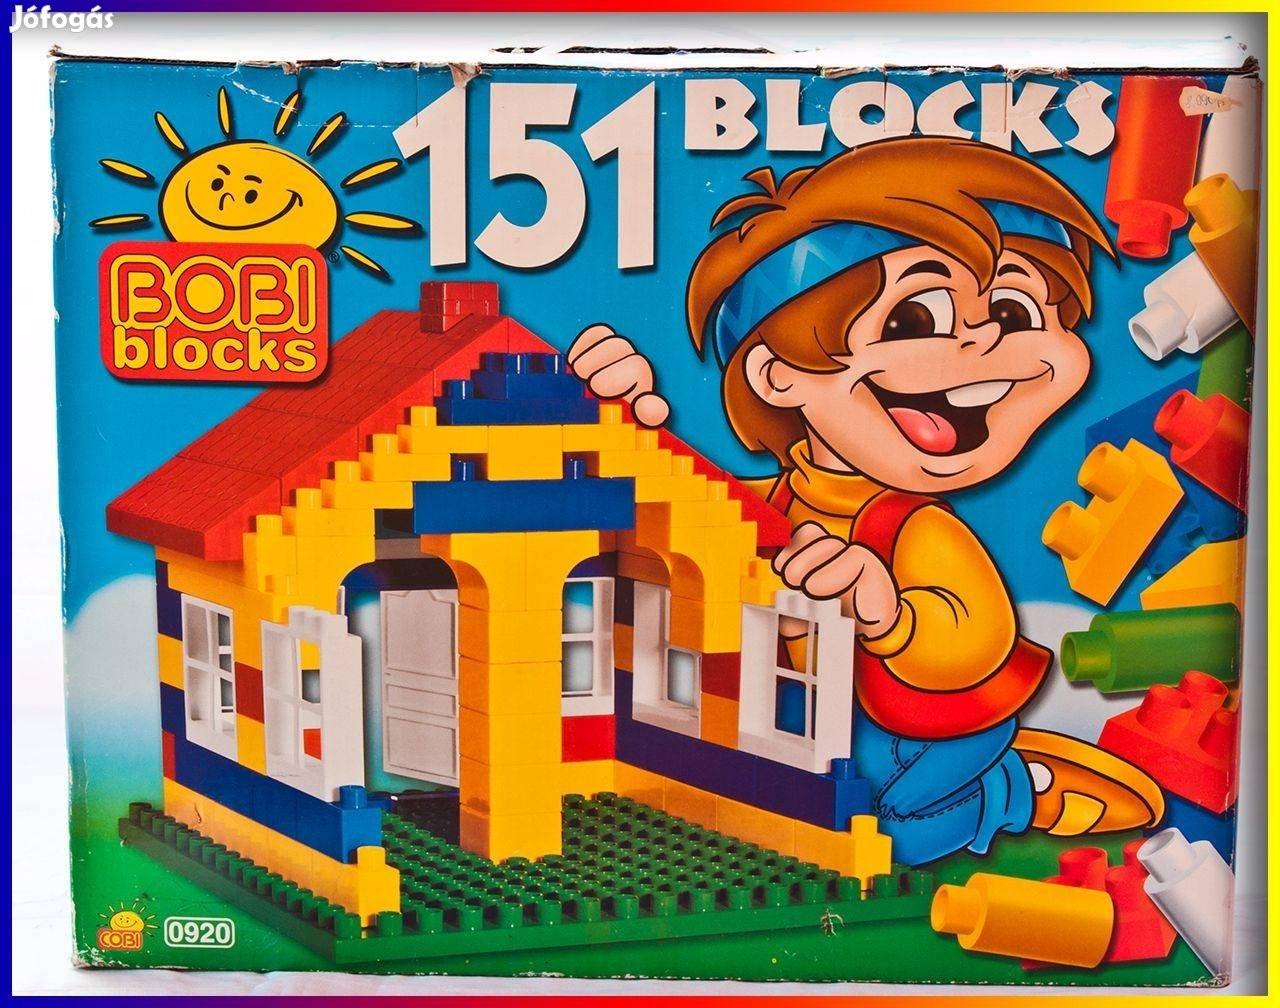 0920 - Bobi - 151 blocks